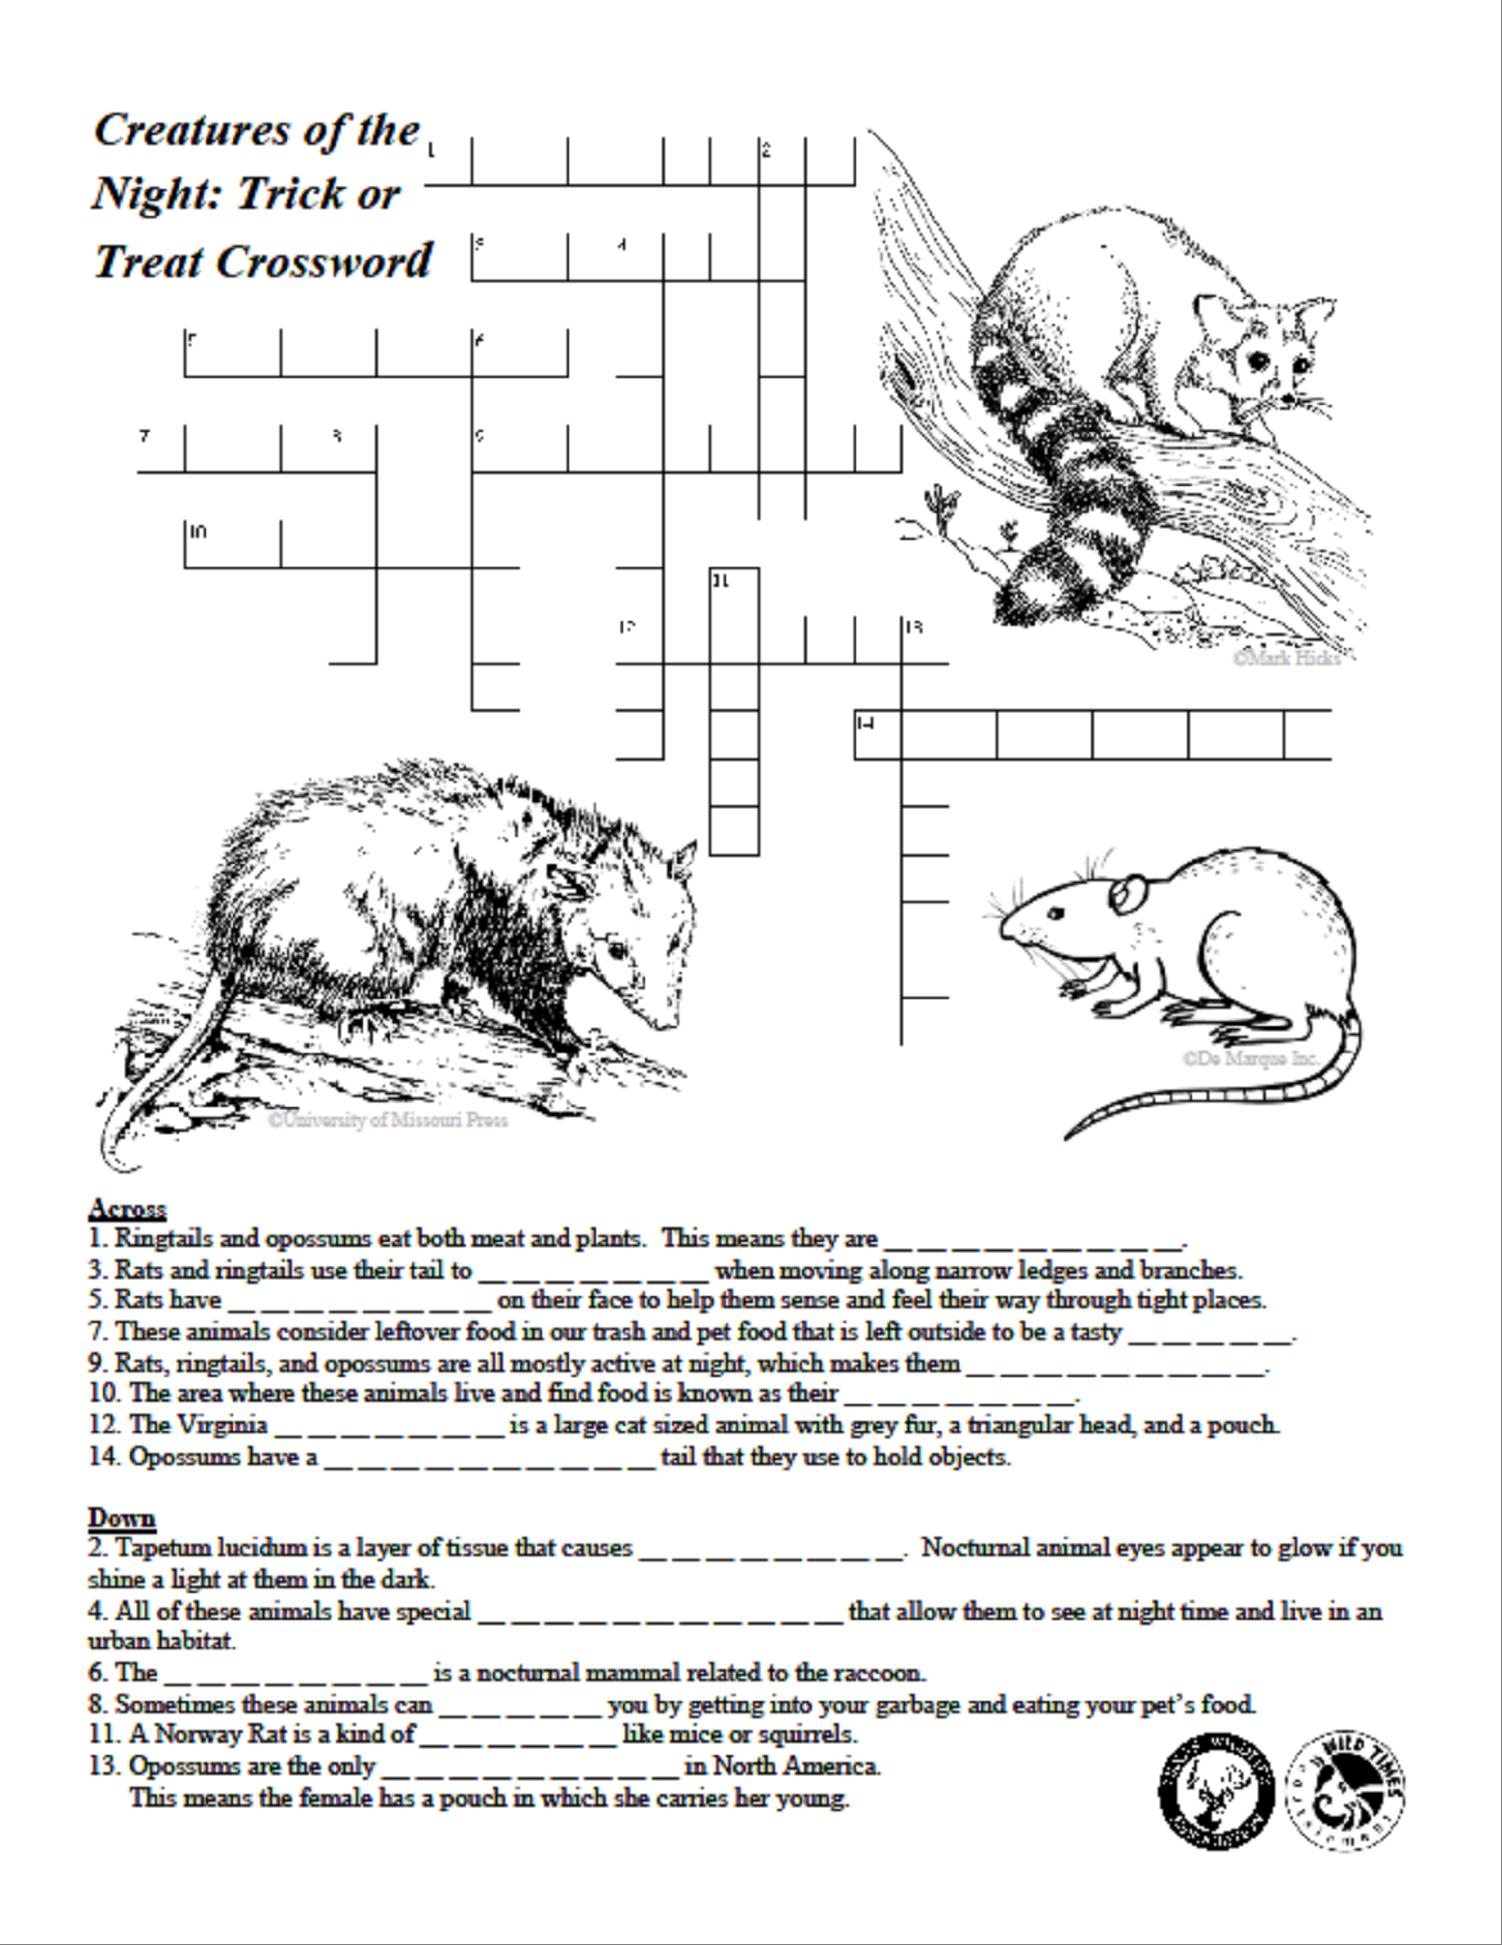 Creatures Of The Night Crossword Puzzle